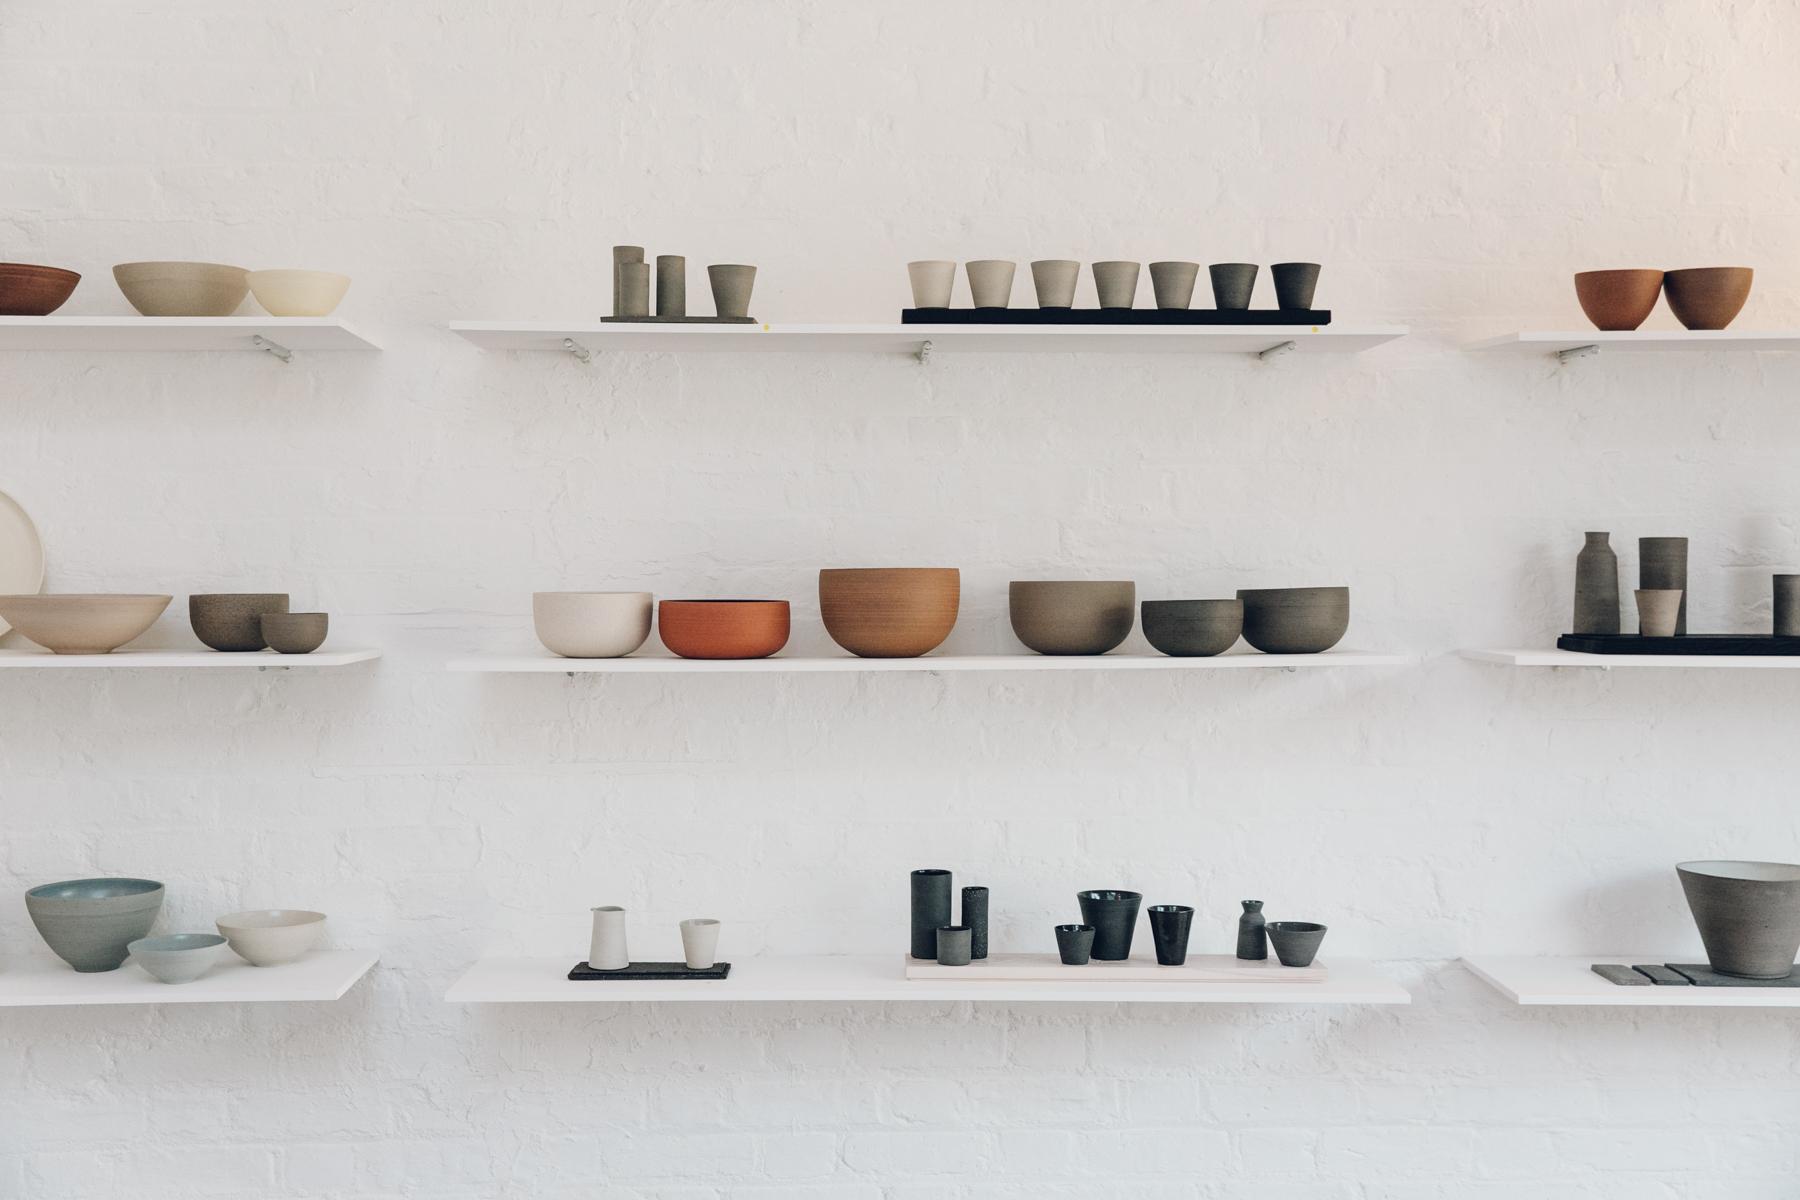 Luke Eastop and Jono Smart ceramics exhibition